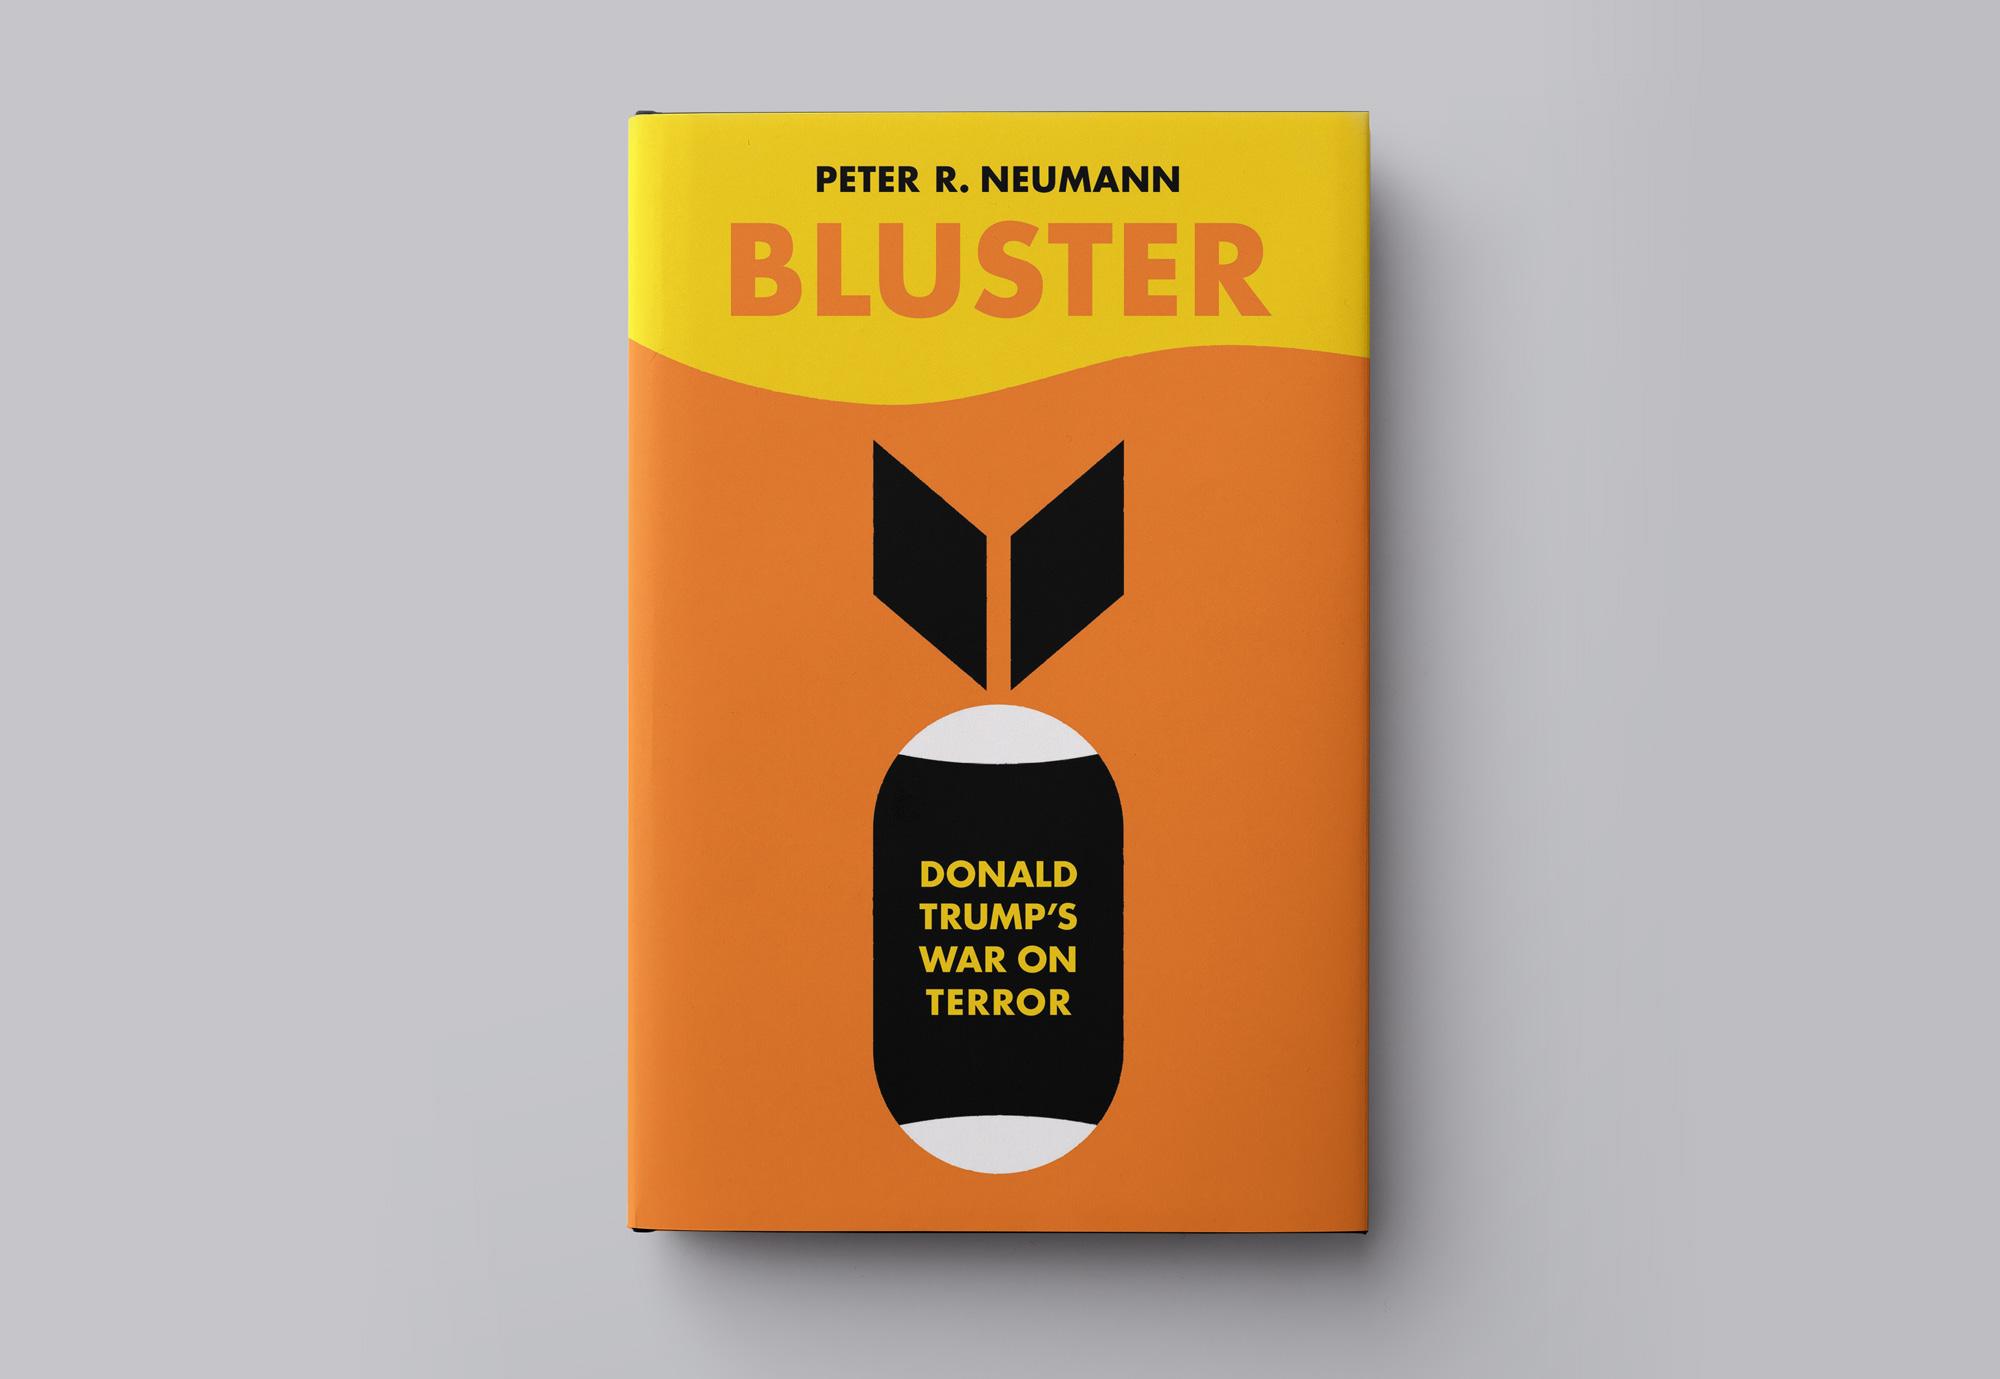 bluster-1.jpg